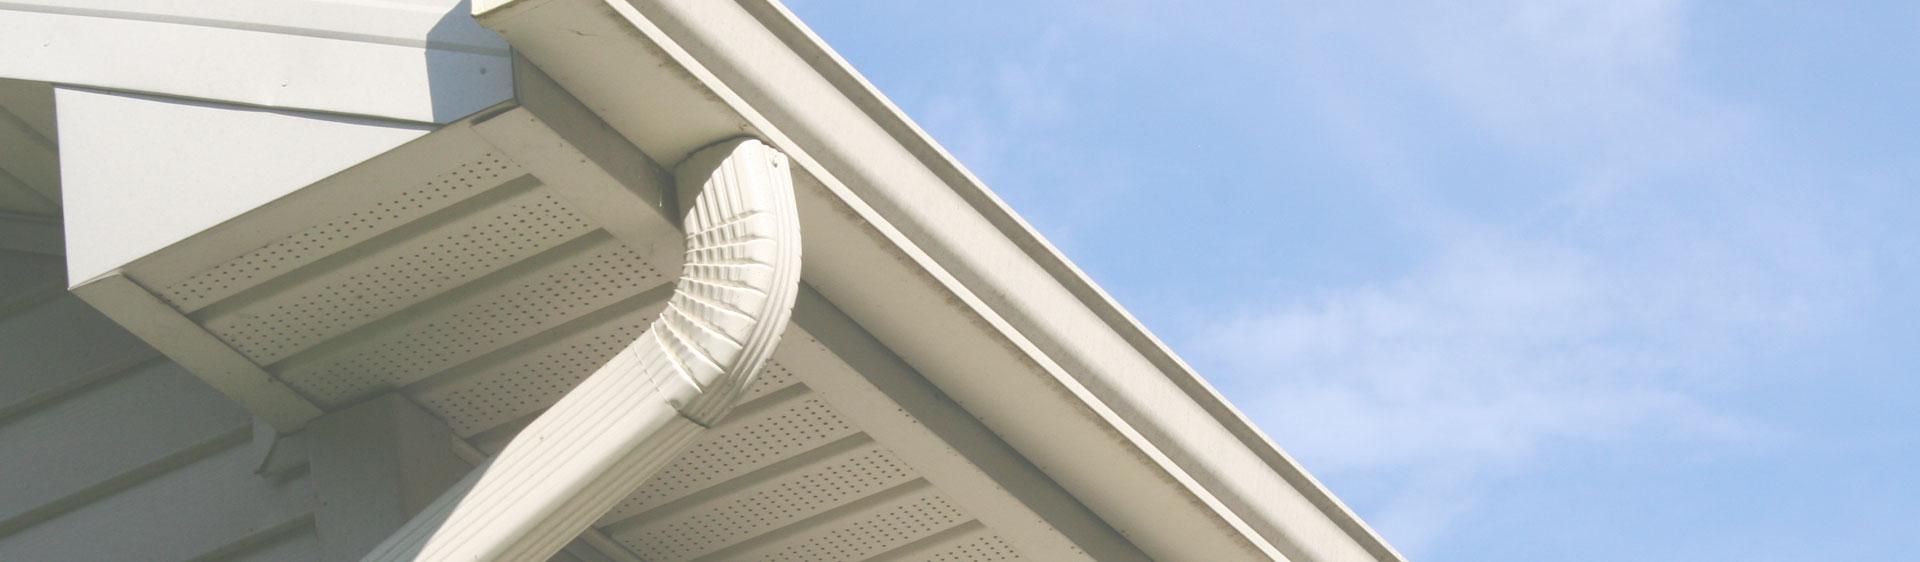 Toronto  Siding Services, Window Installation  and Gutter Installation